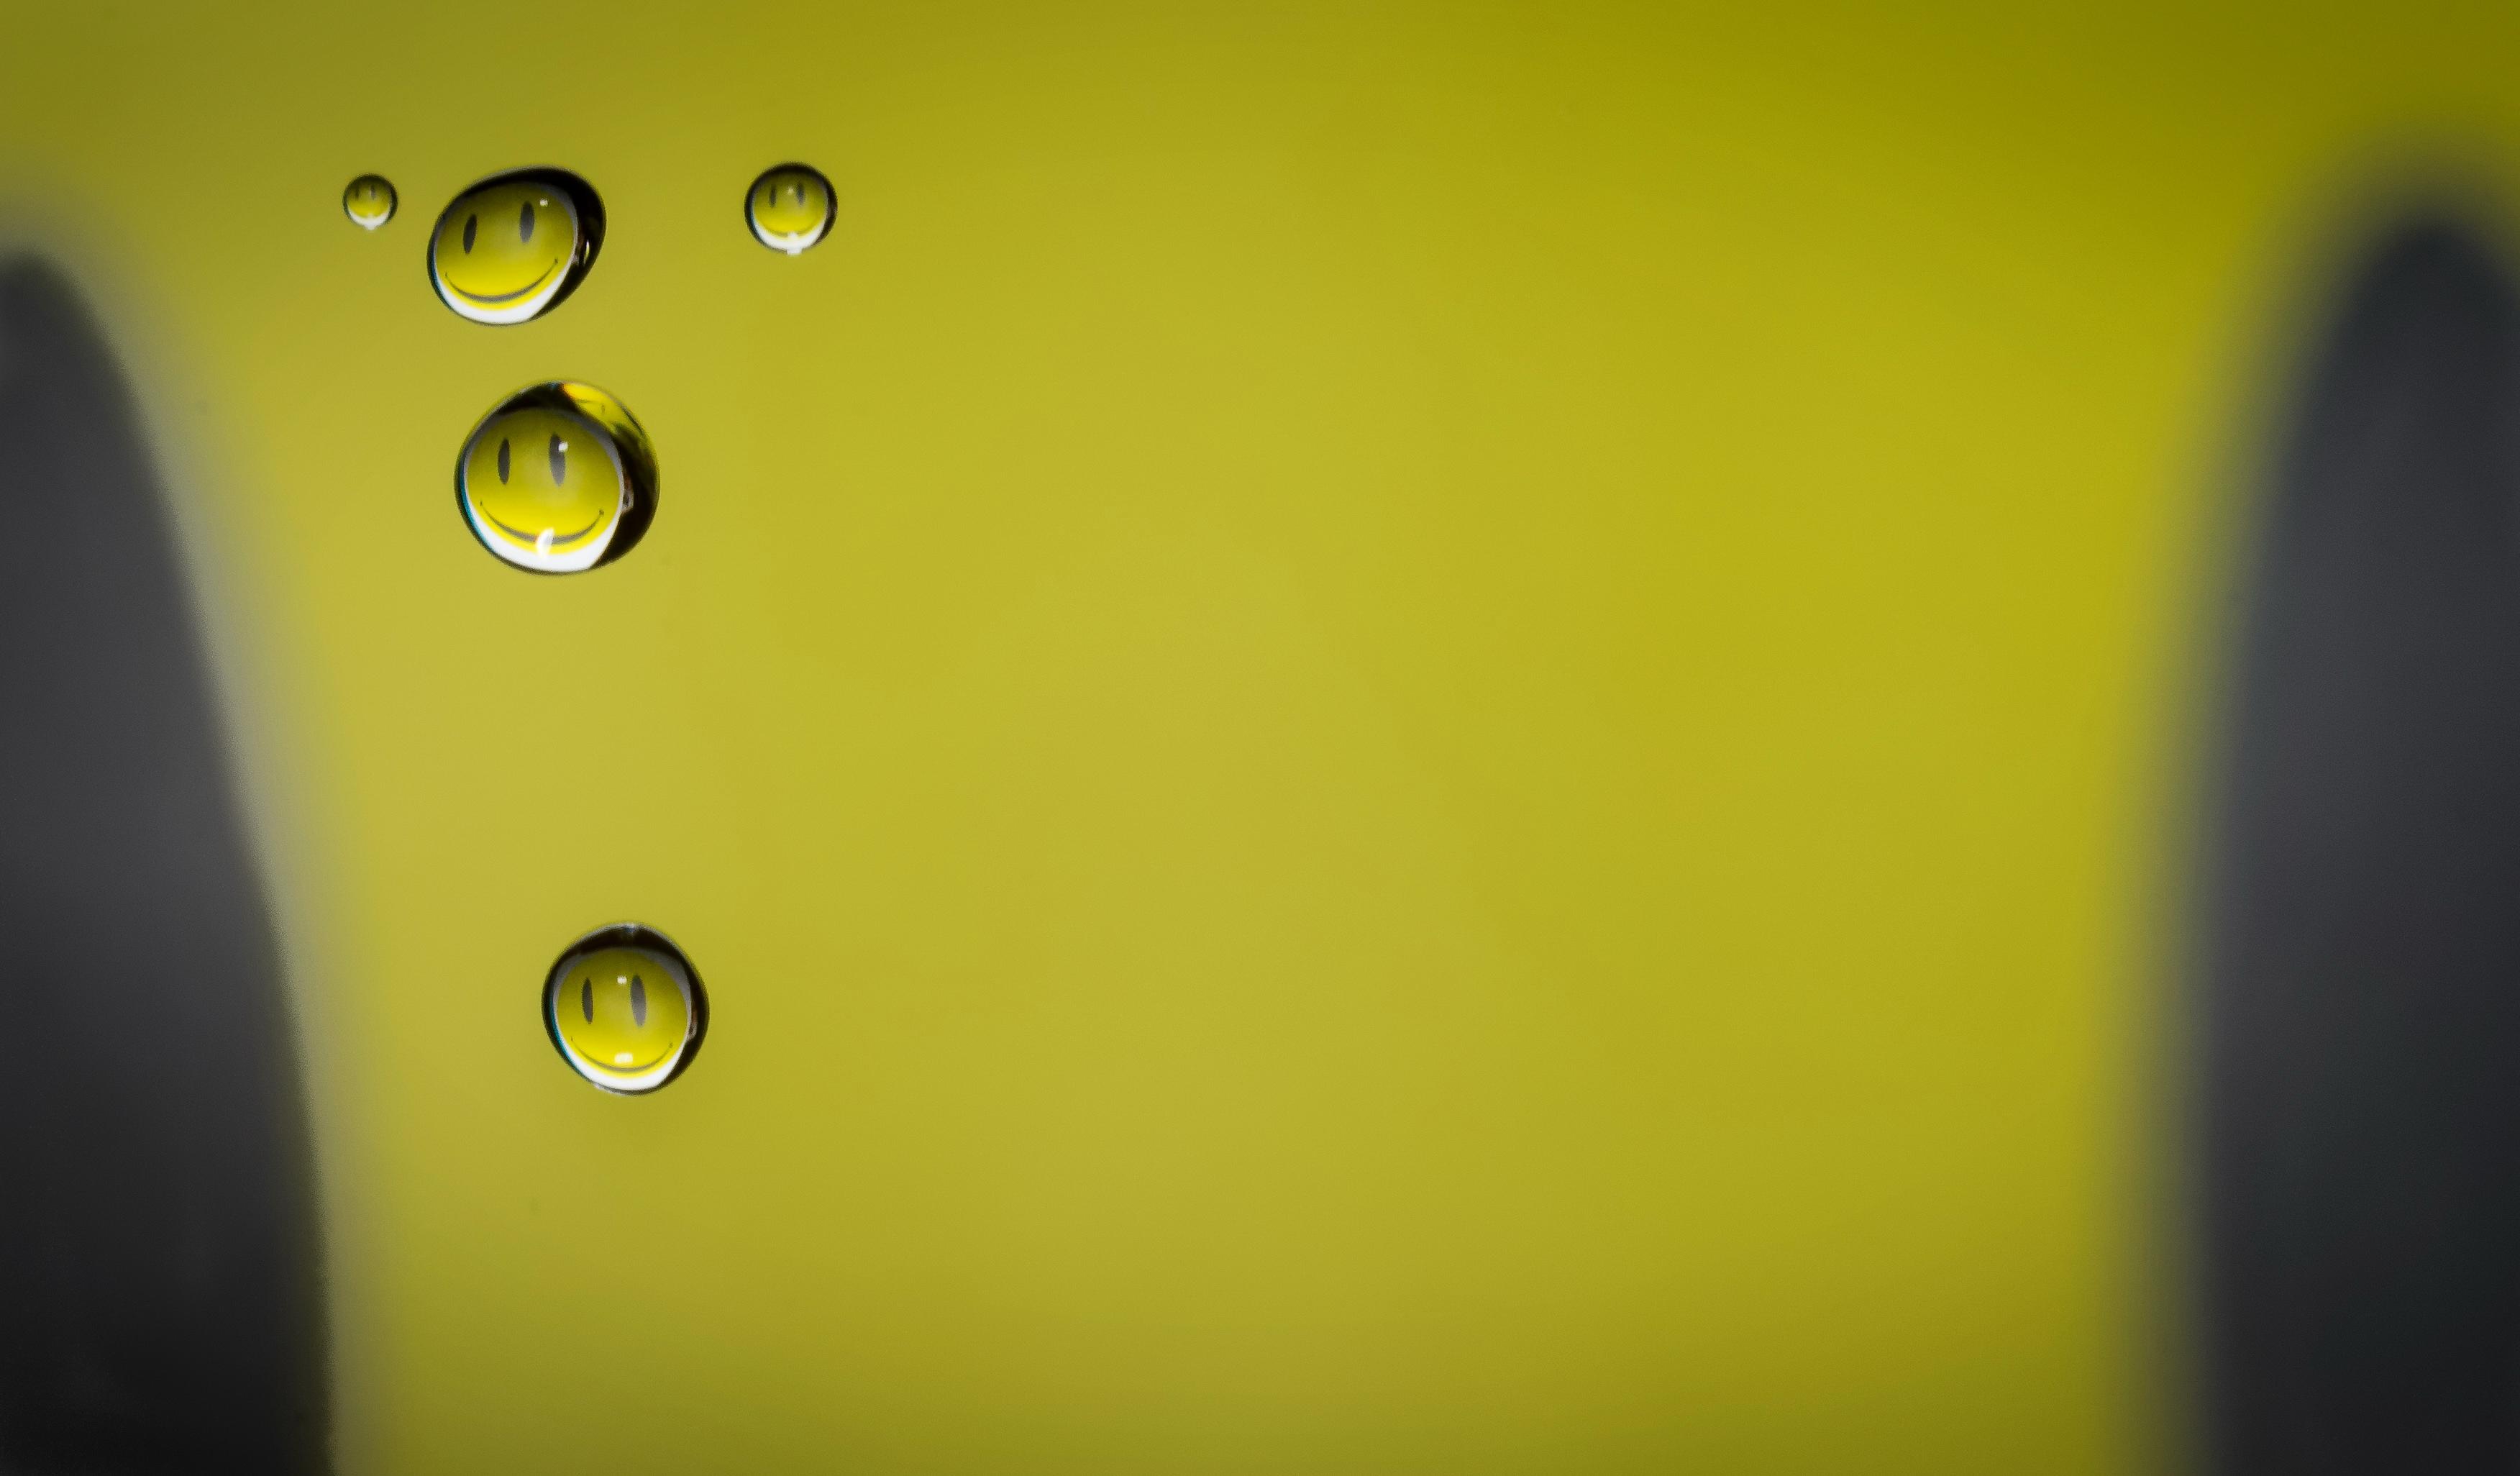 Wallpaper Smiley Droplet Water Waterdrop D7200 Nikon Sigma